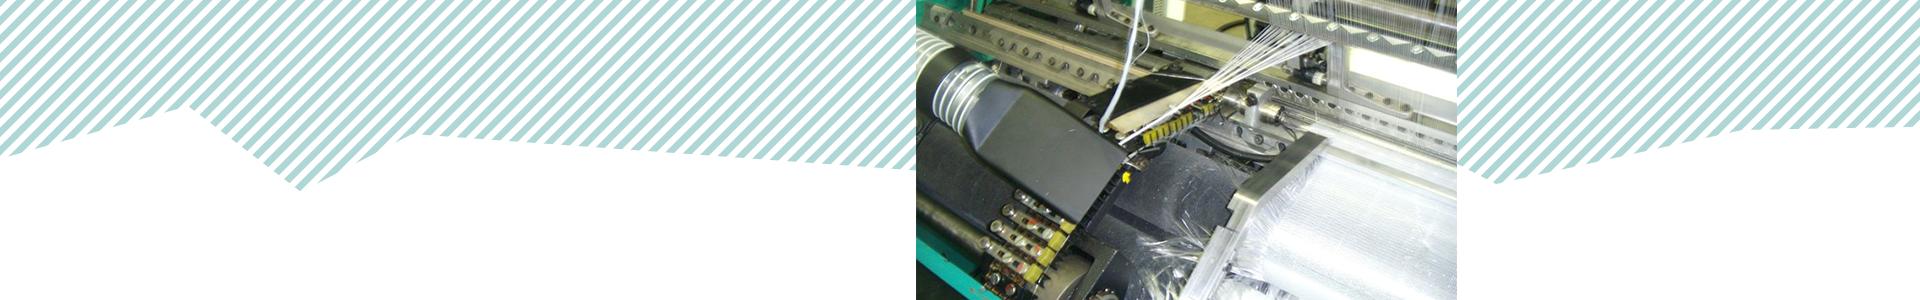 Schmietex Engineering: Gebrauchtmaschinen